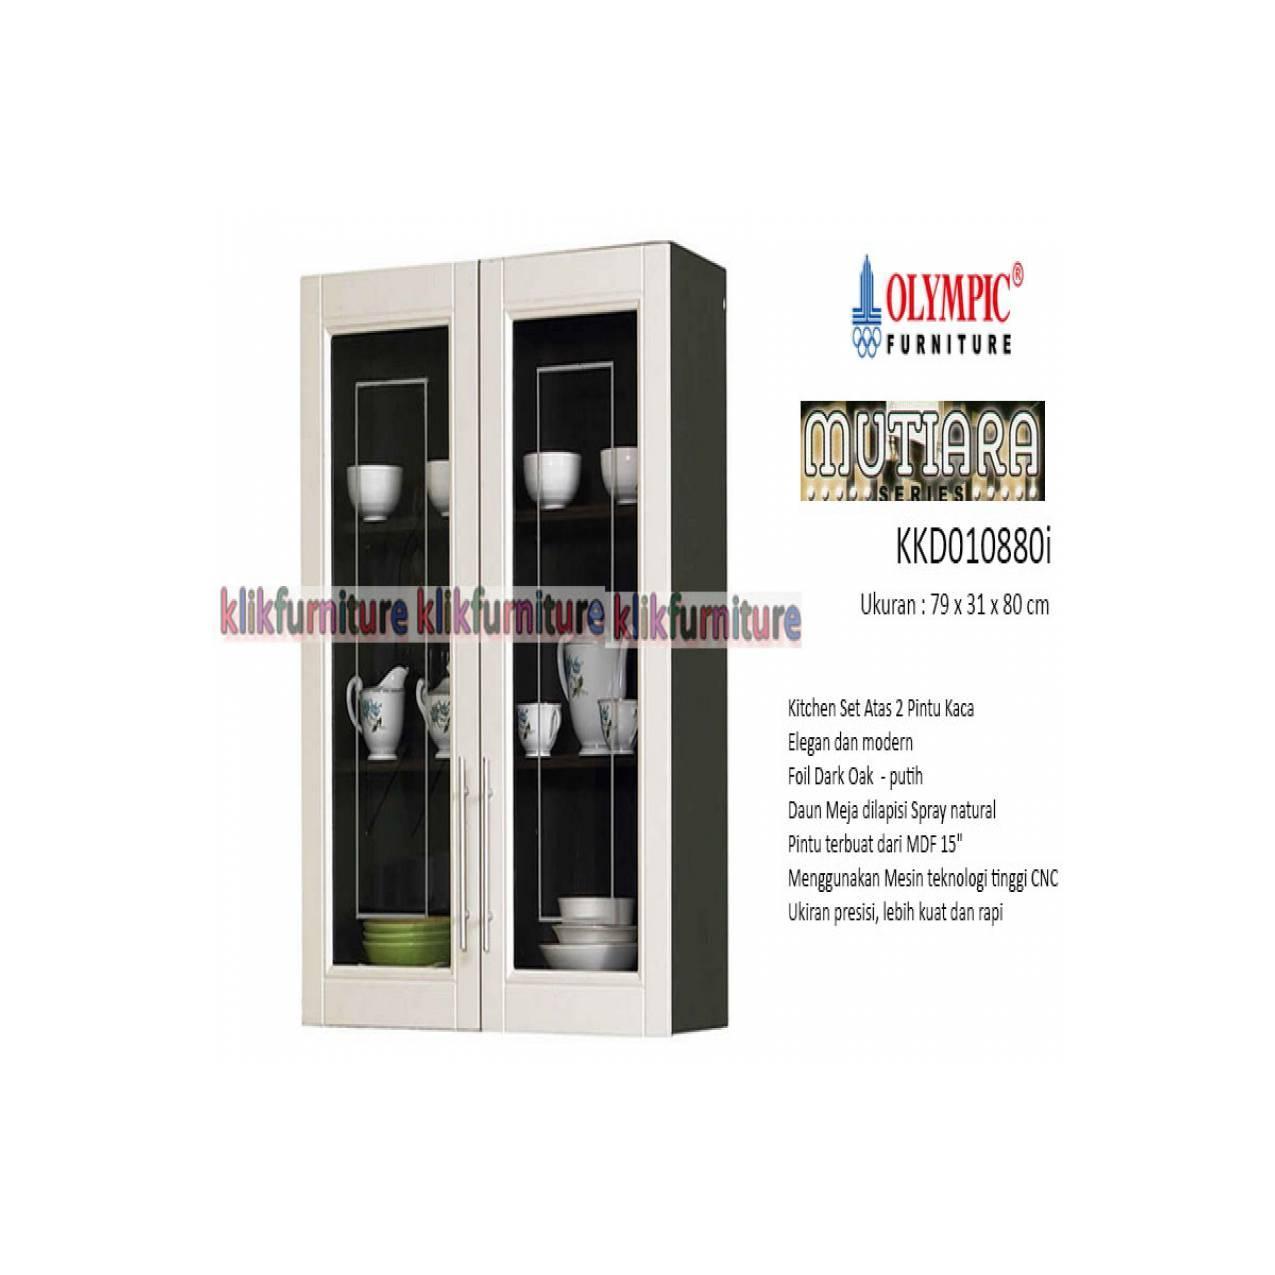 KKD 010880i Olympic Mutiara Kitchen Set Atas 2 Pintu